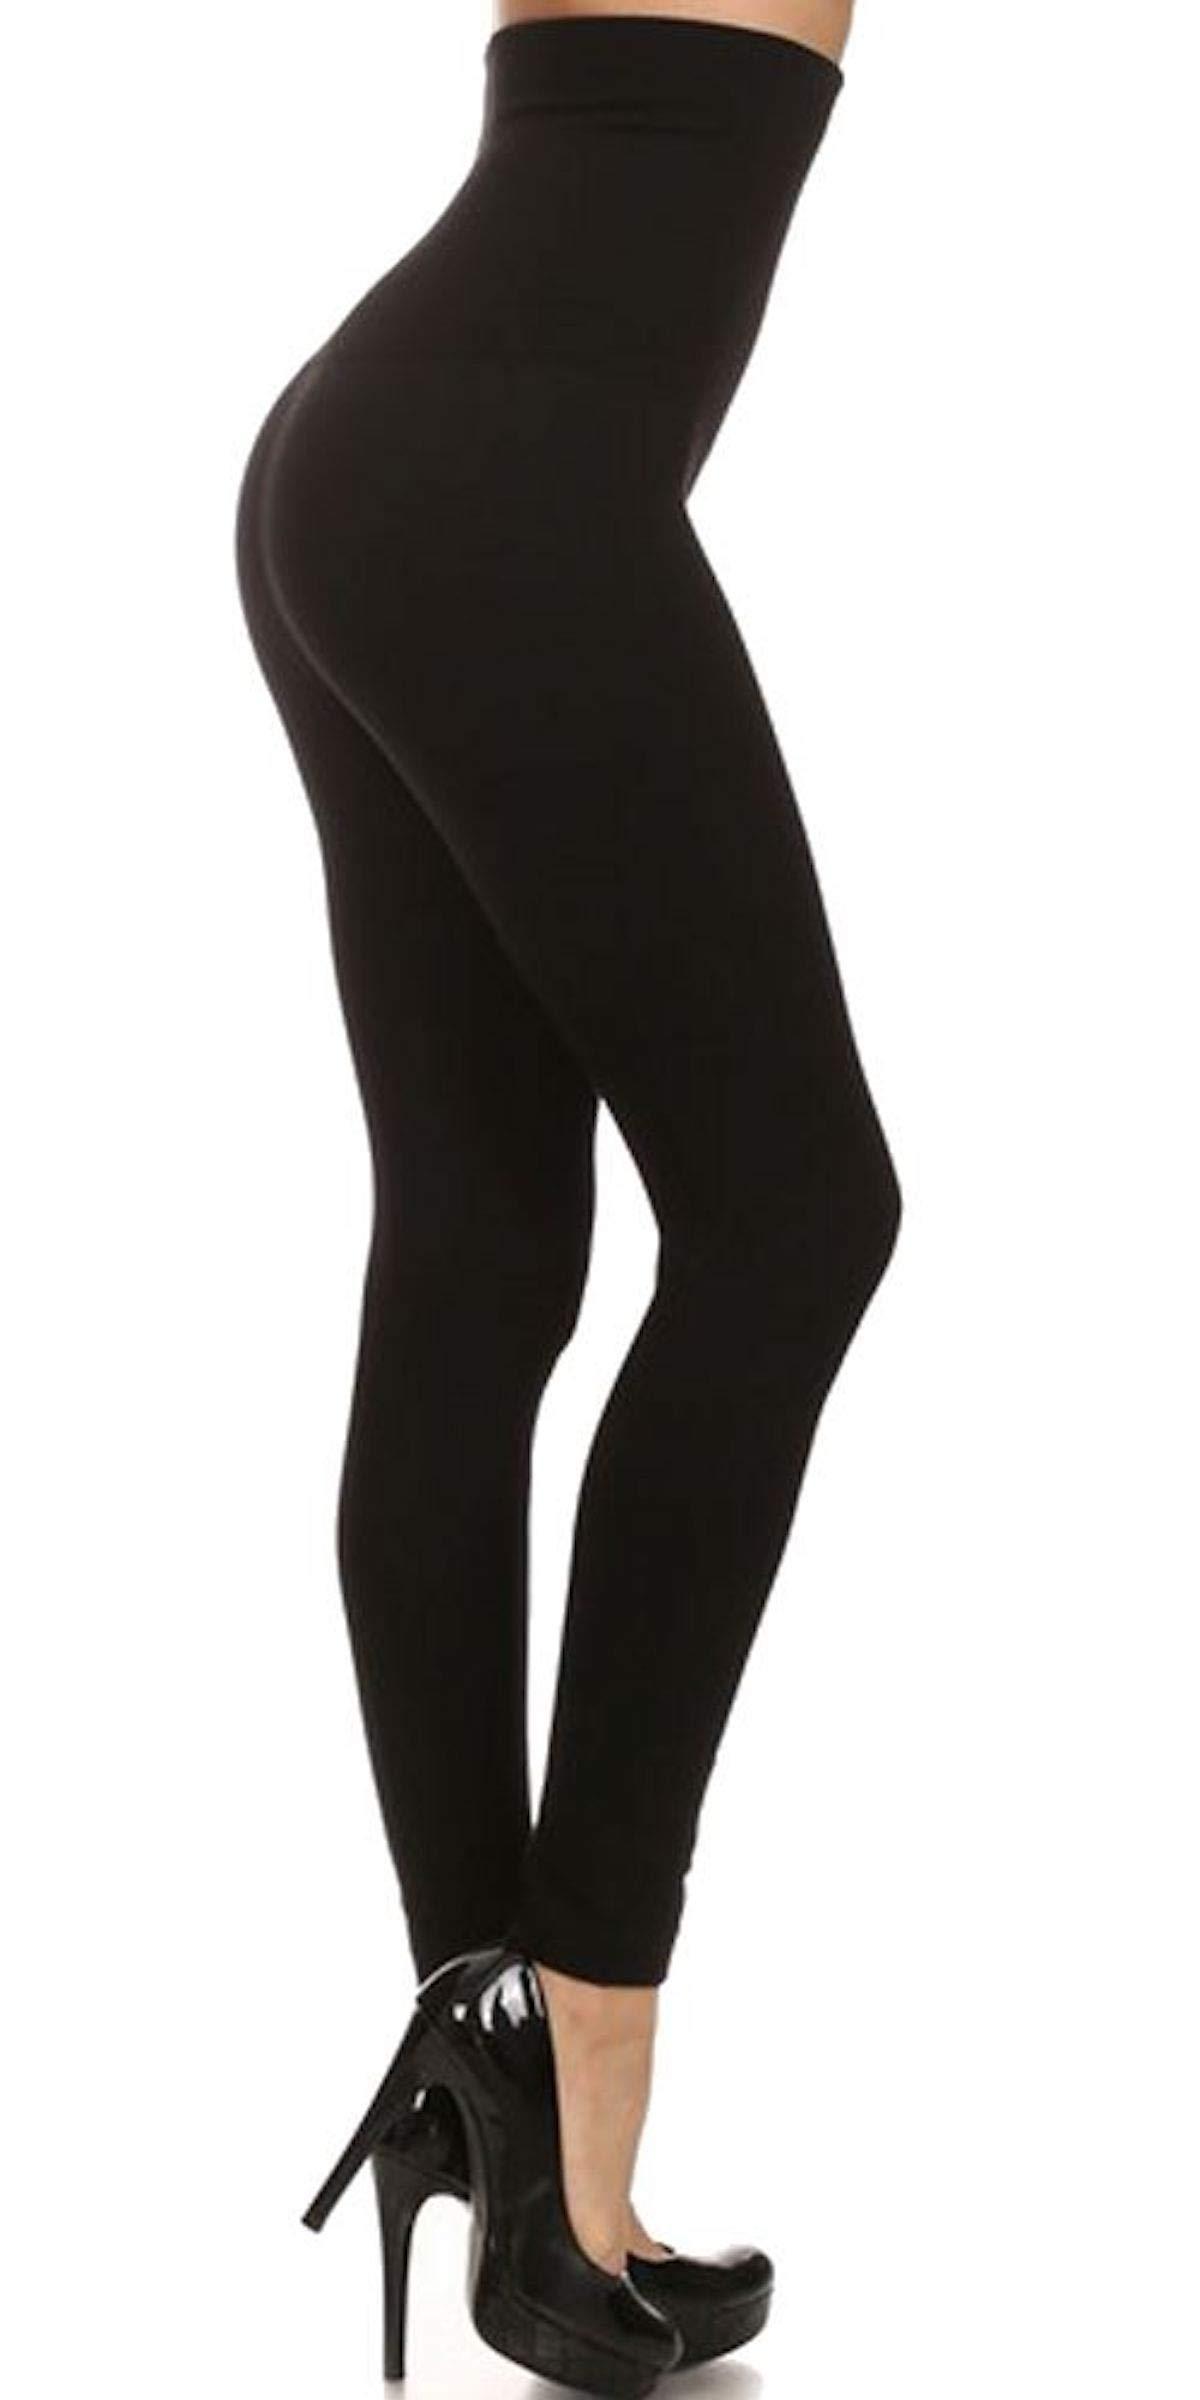 8Layer's No More Muffin Top! High Waisted Tummy Control Leggings - Compression Top - Slimming Leggings - Fleece & Non Fleece Leggings - Contours Waistline (Non French Terry, Black)